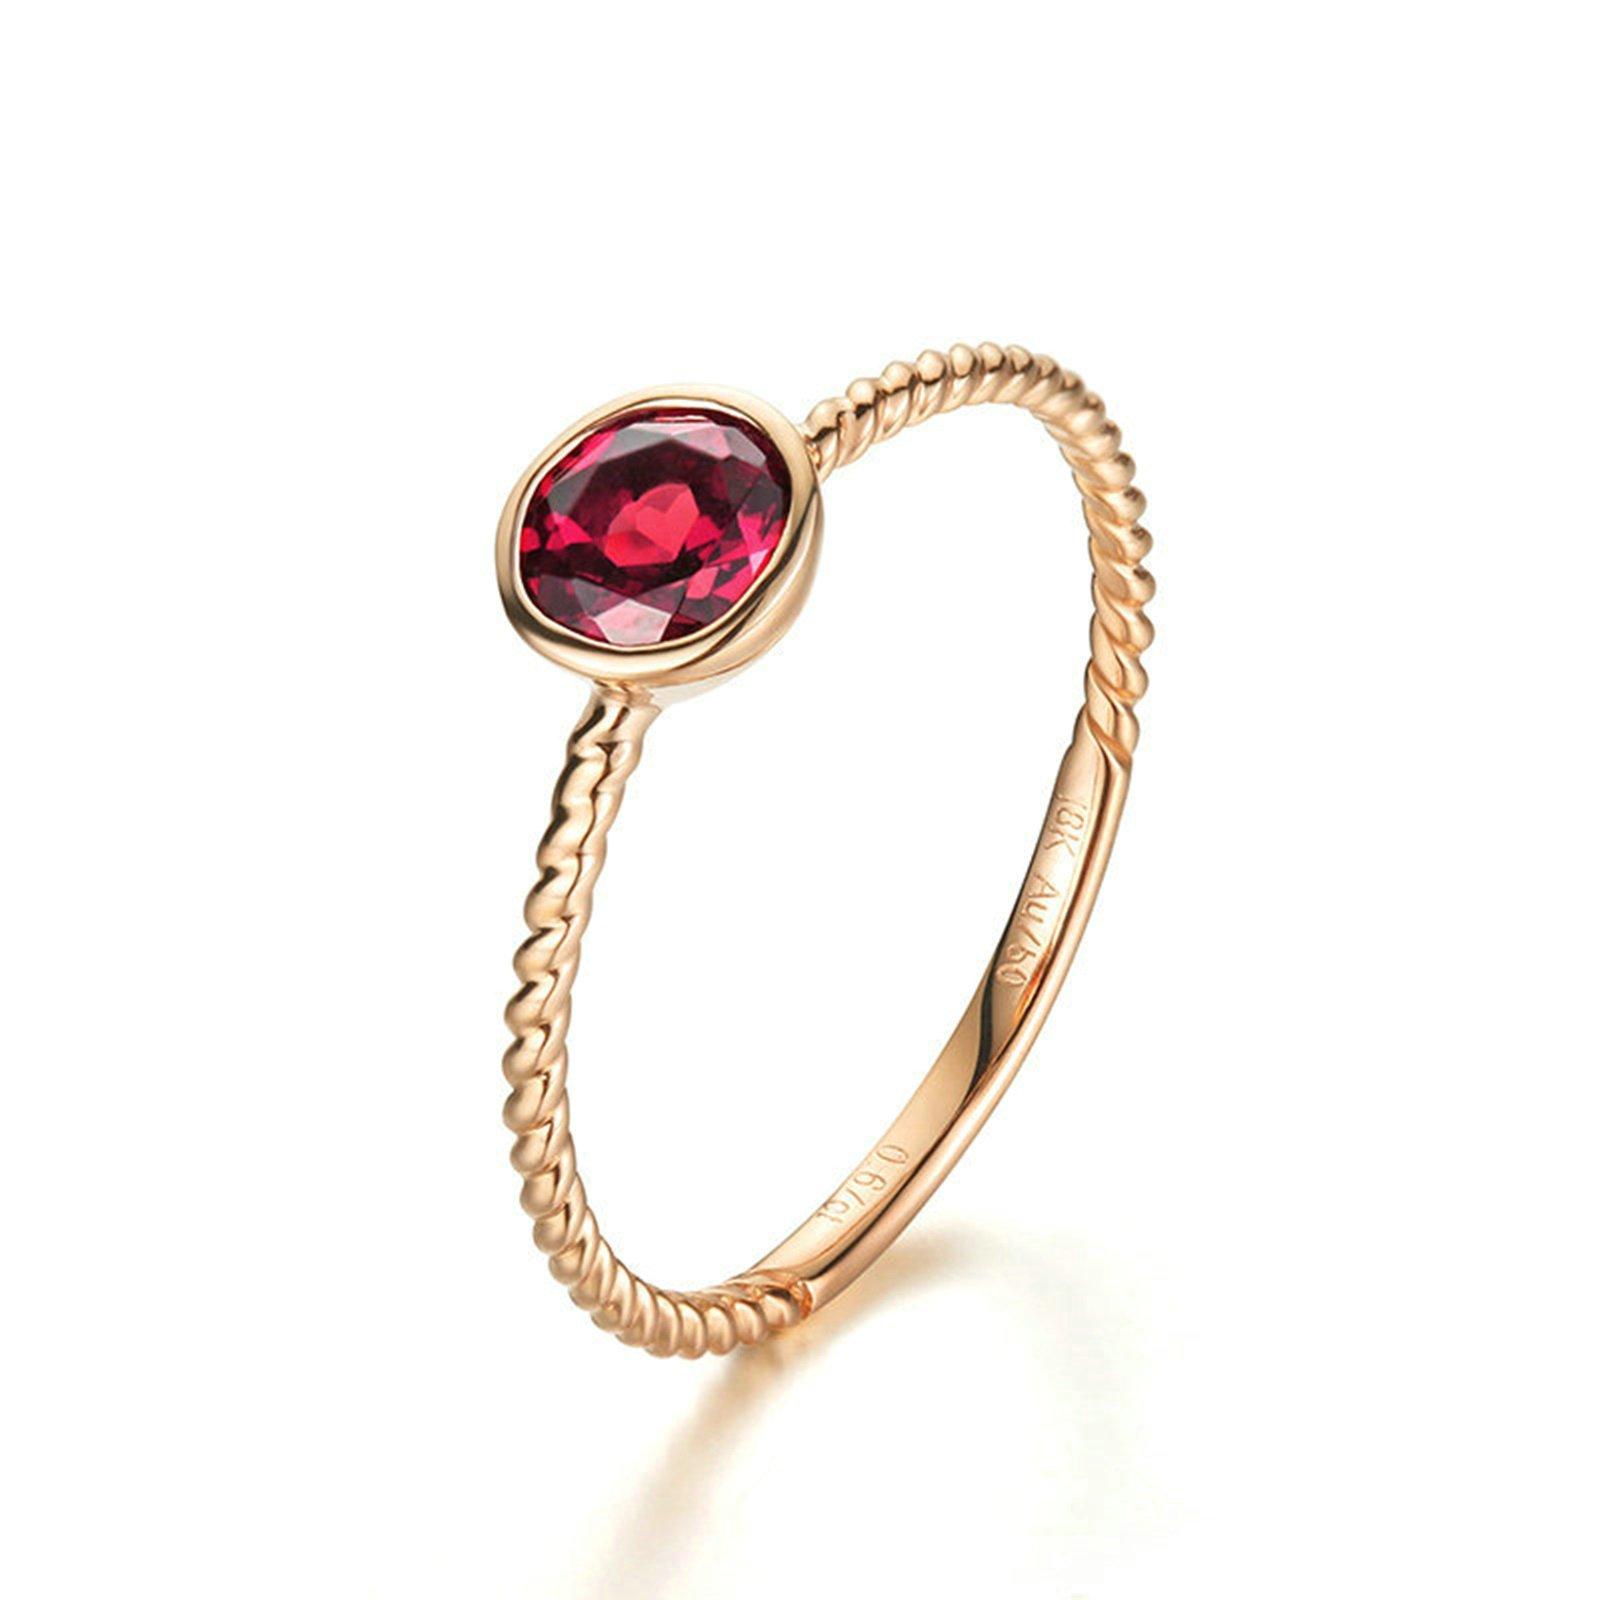 18K Gold Ring(Au750) Round Cut Red Tourmaline Ring Wedding Engagement Ring for Women Bride Size 4.5 by Epinki